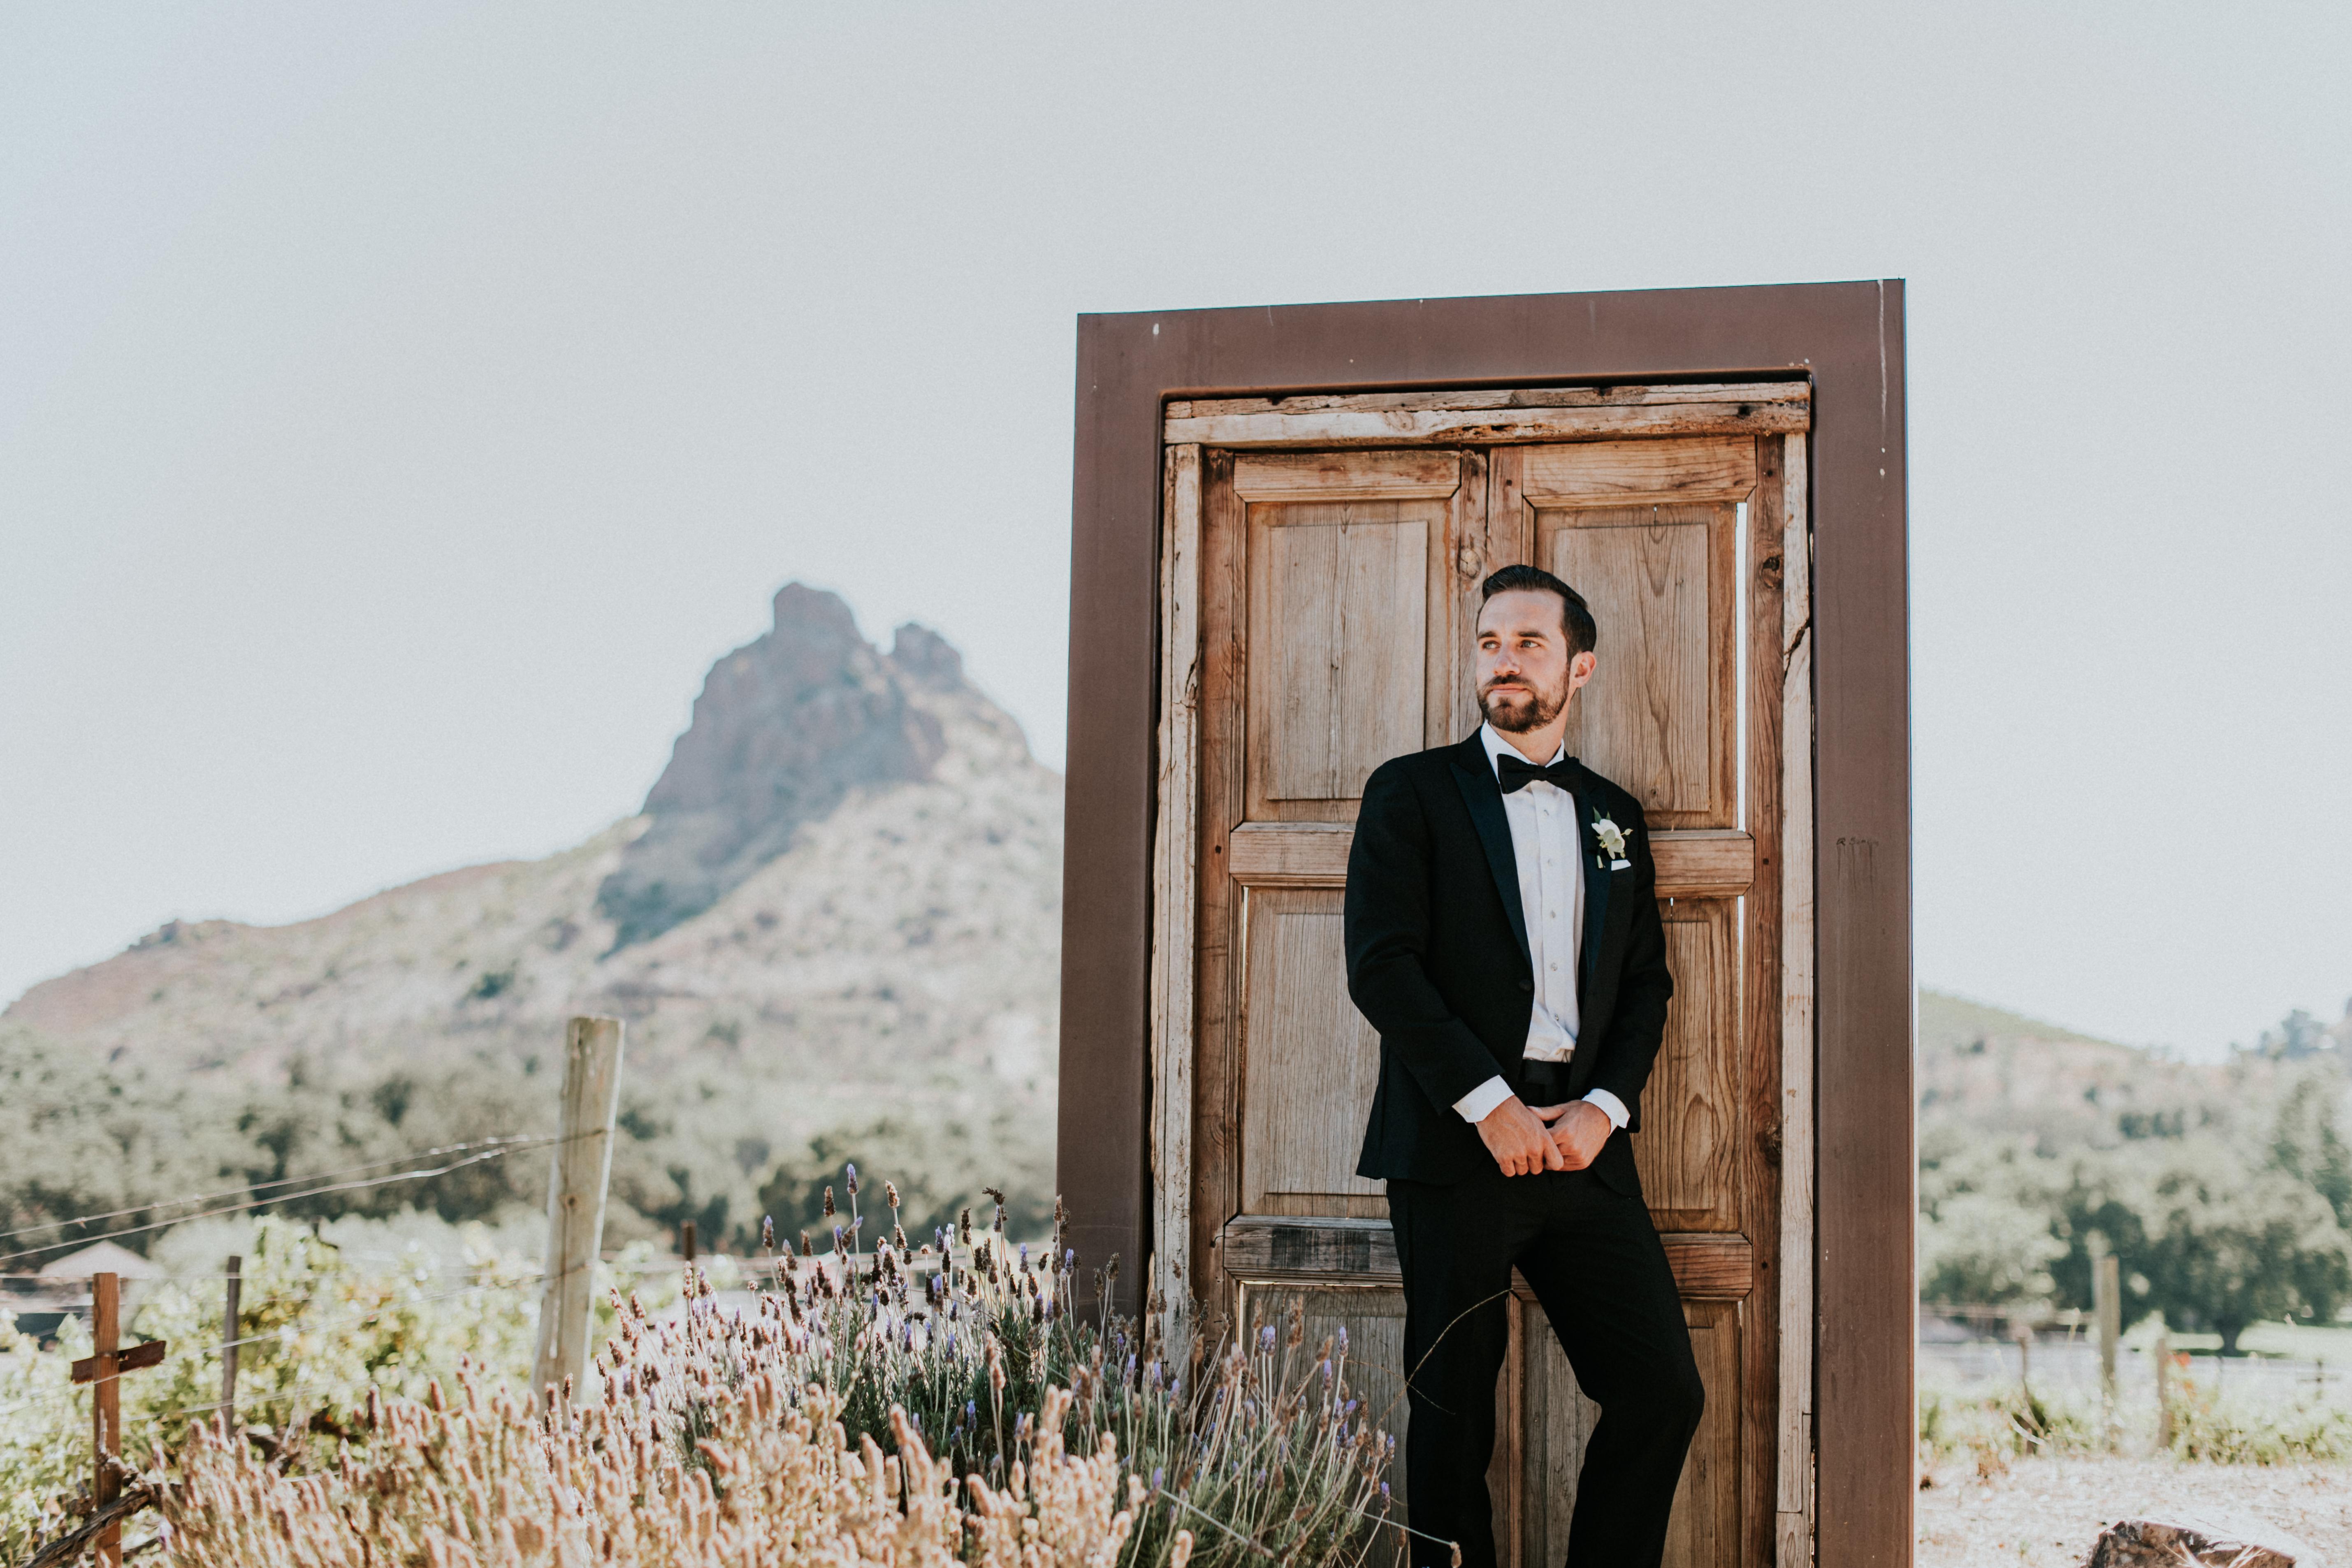 groom in tuxedo malibu wedding photography los angeles